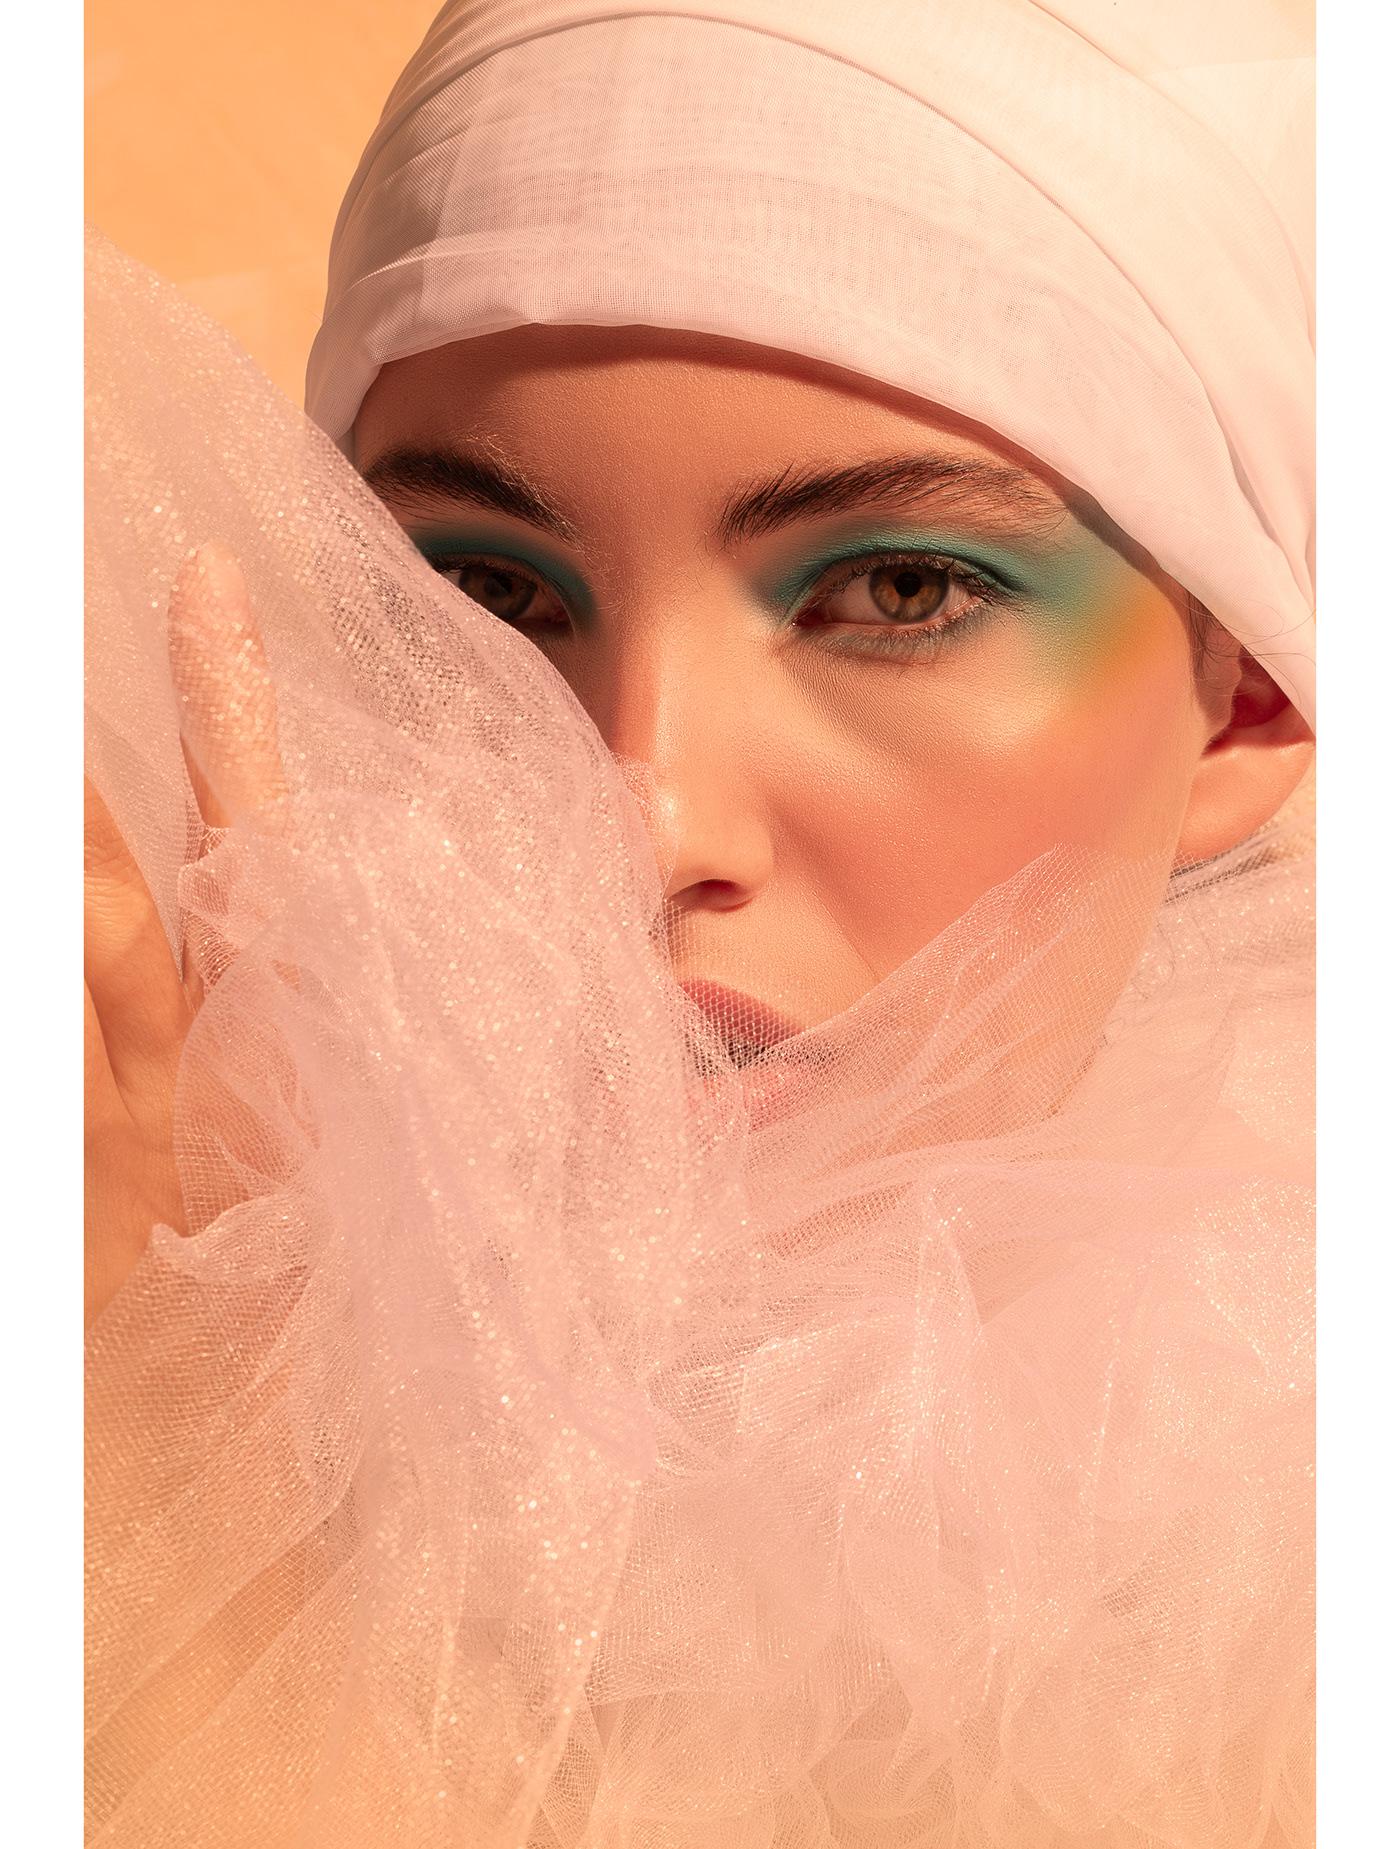 art direction  ArtDirection editorial ESBOF Fashion  Photography  Pierrot portrait retrato